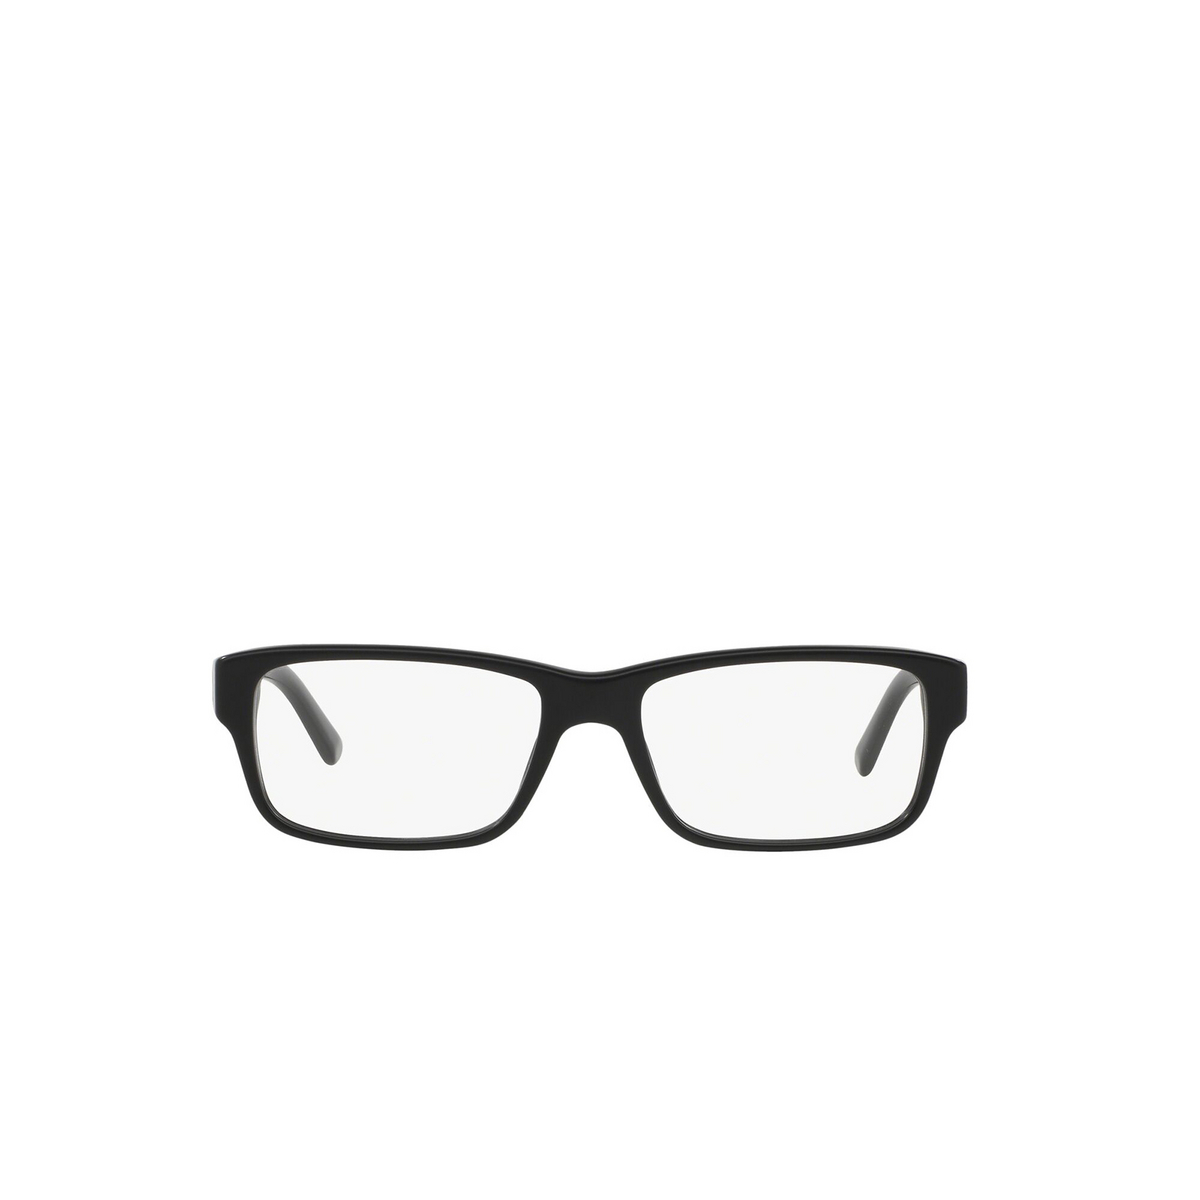 Prada® Rectangle Eyeglasses: Heritage PR 16MV color Matte Black 1BO1O1 - front view.